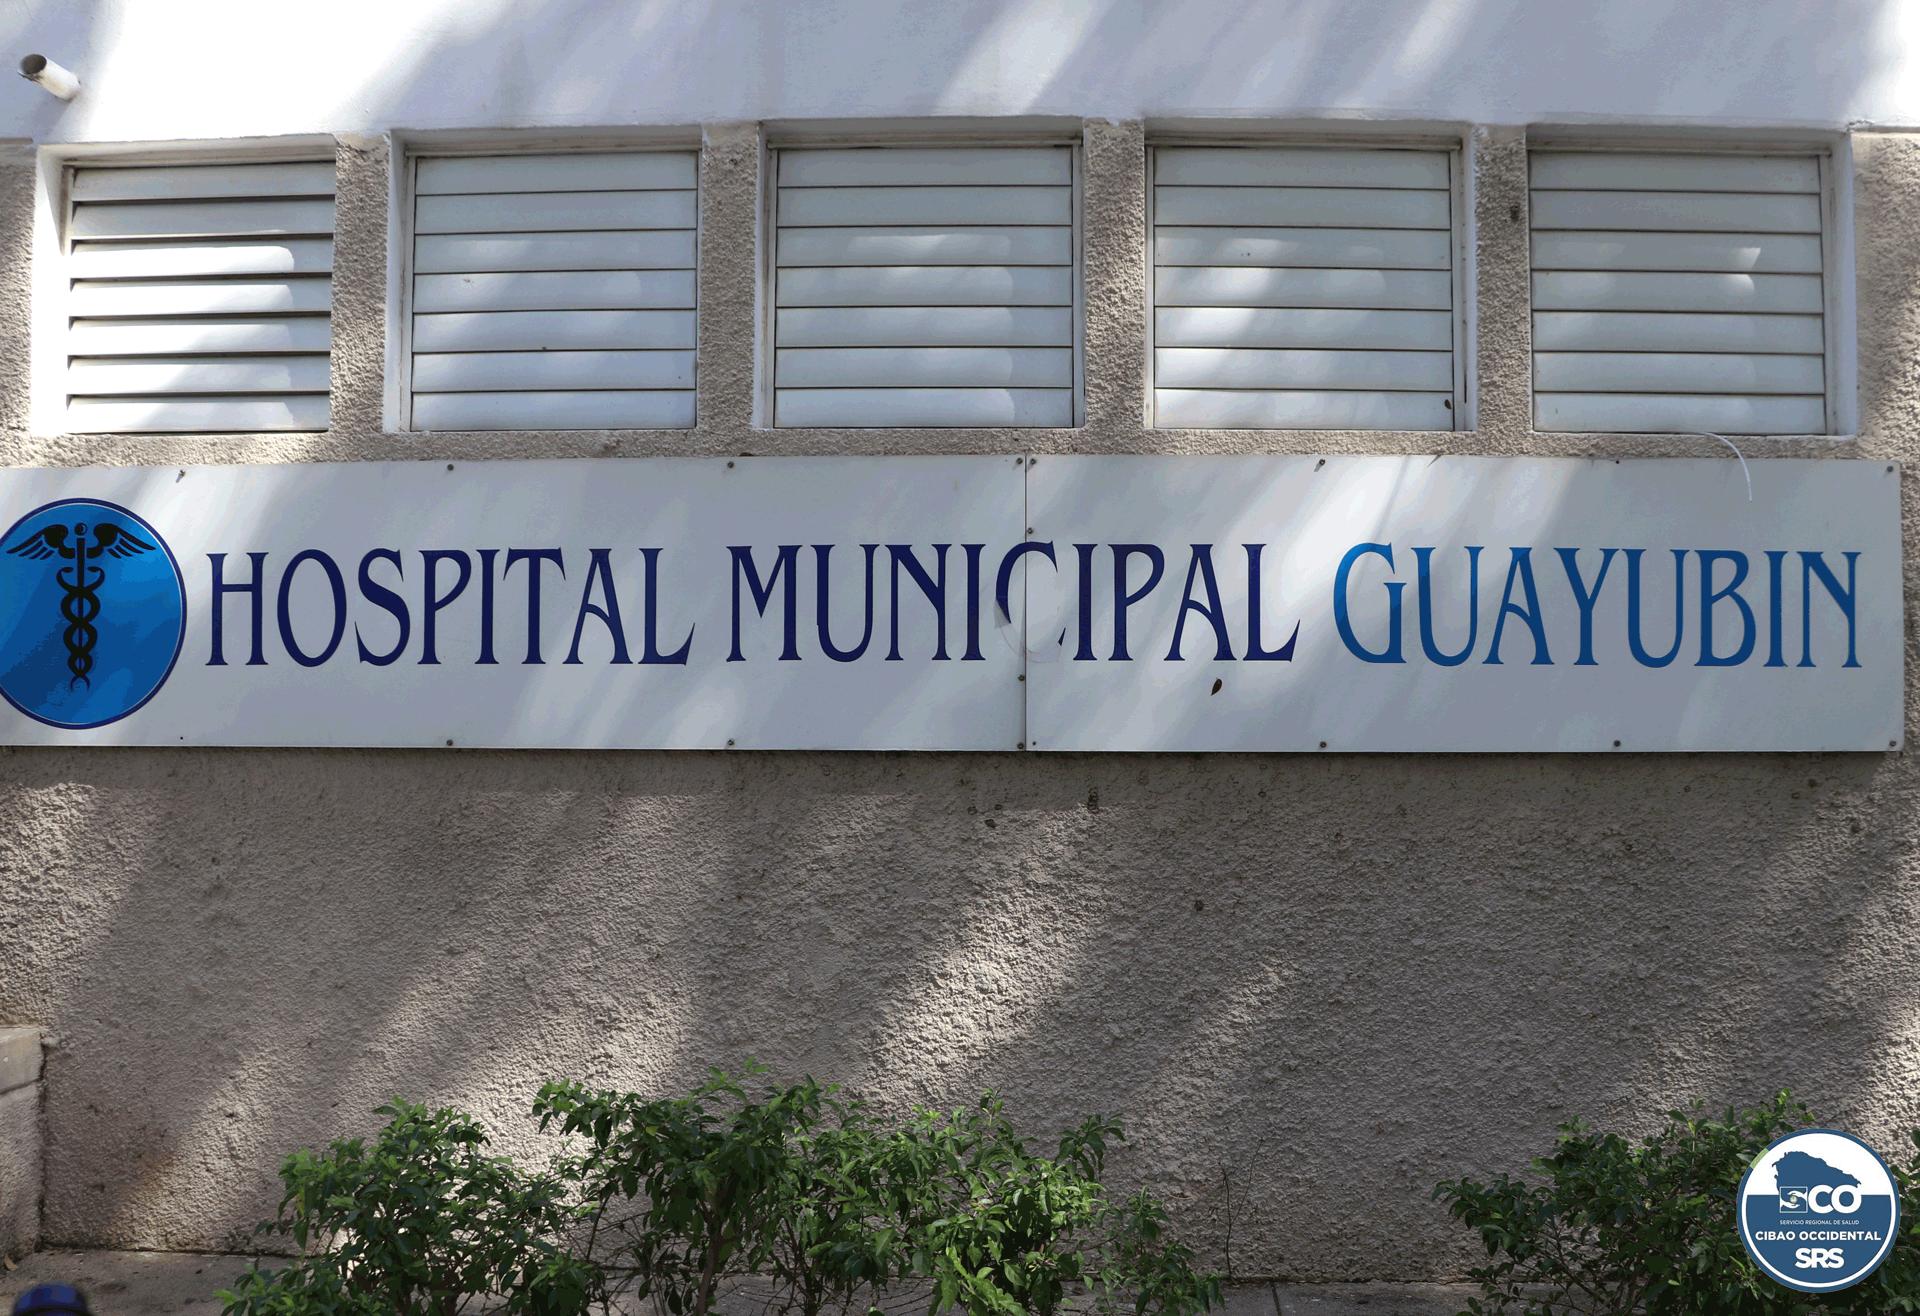 SRSCO, R7; RECIBE EQUIPOS PARA LABORATORIO DEL HOSPITAL MUNICIPAL DE GUAYUBIN.